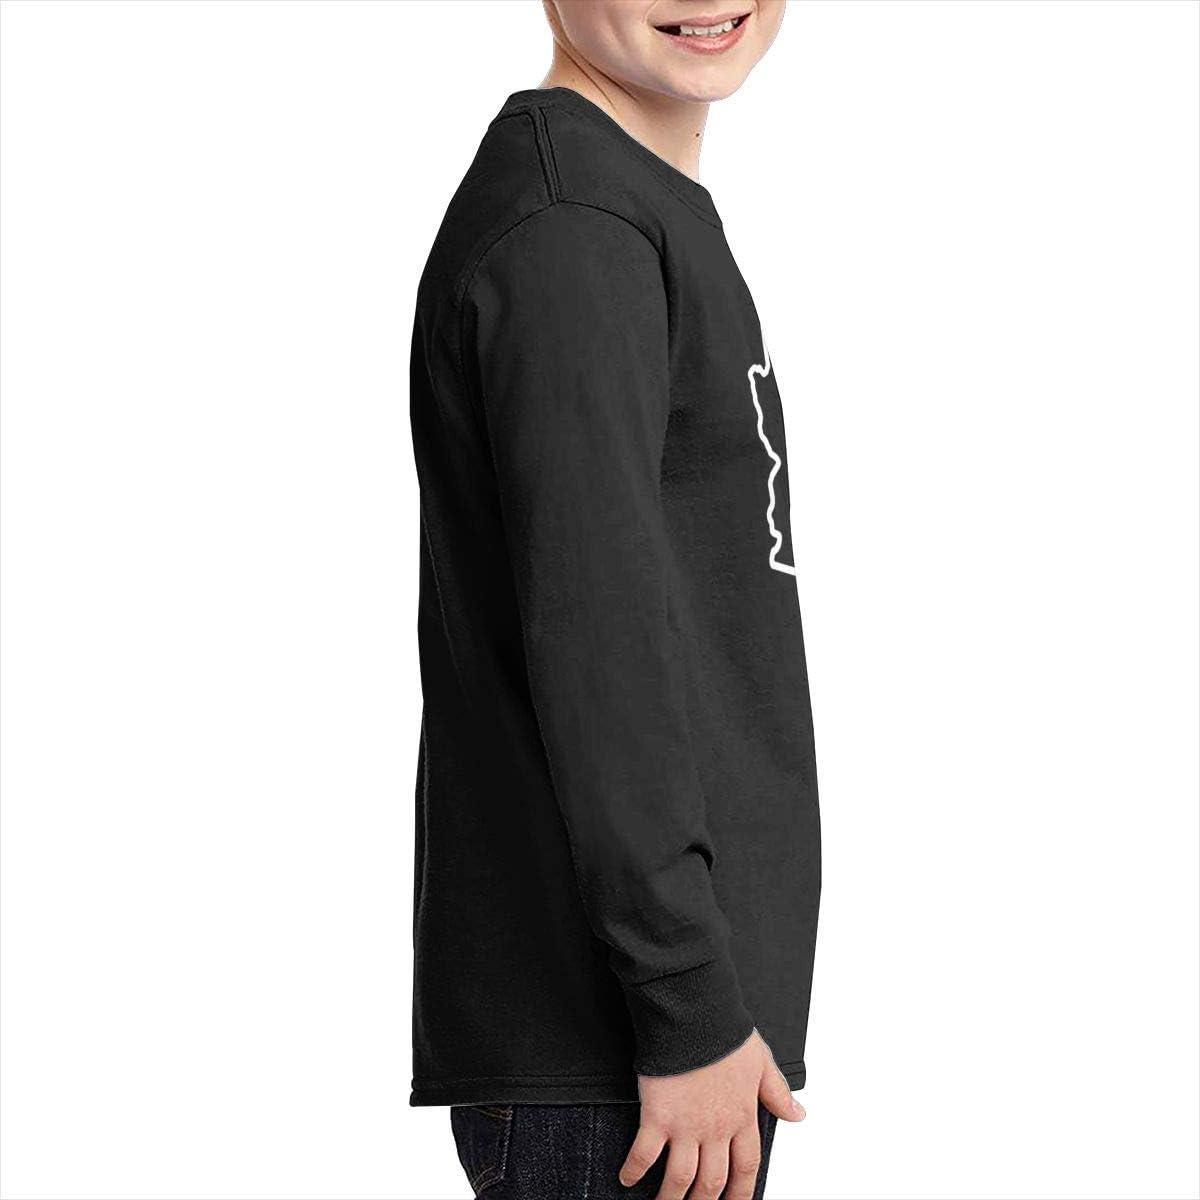 Arizona Desert Cactus Home Big Boys Athletic Pullover Sweatshirt Casual Shirt